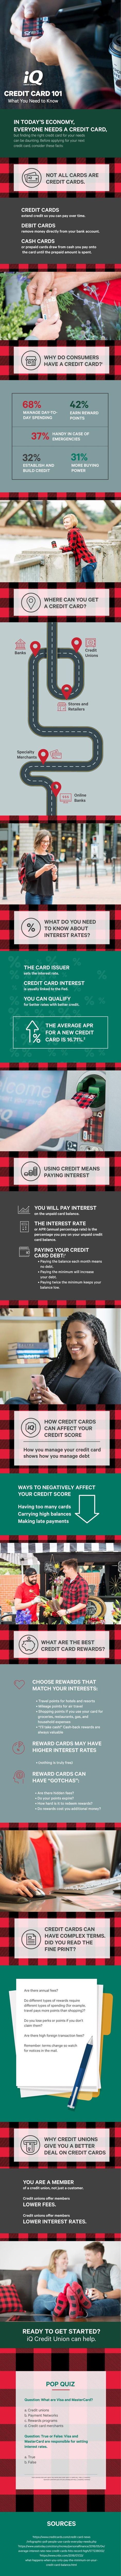 iQcu_CreditCardInfographic_final